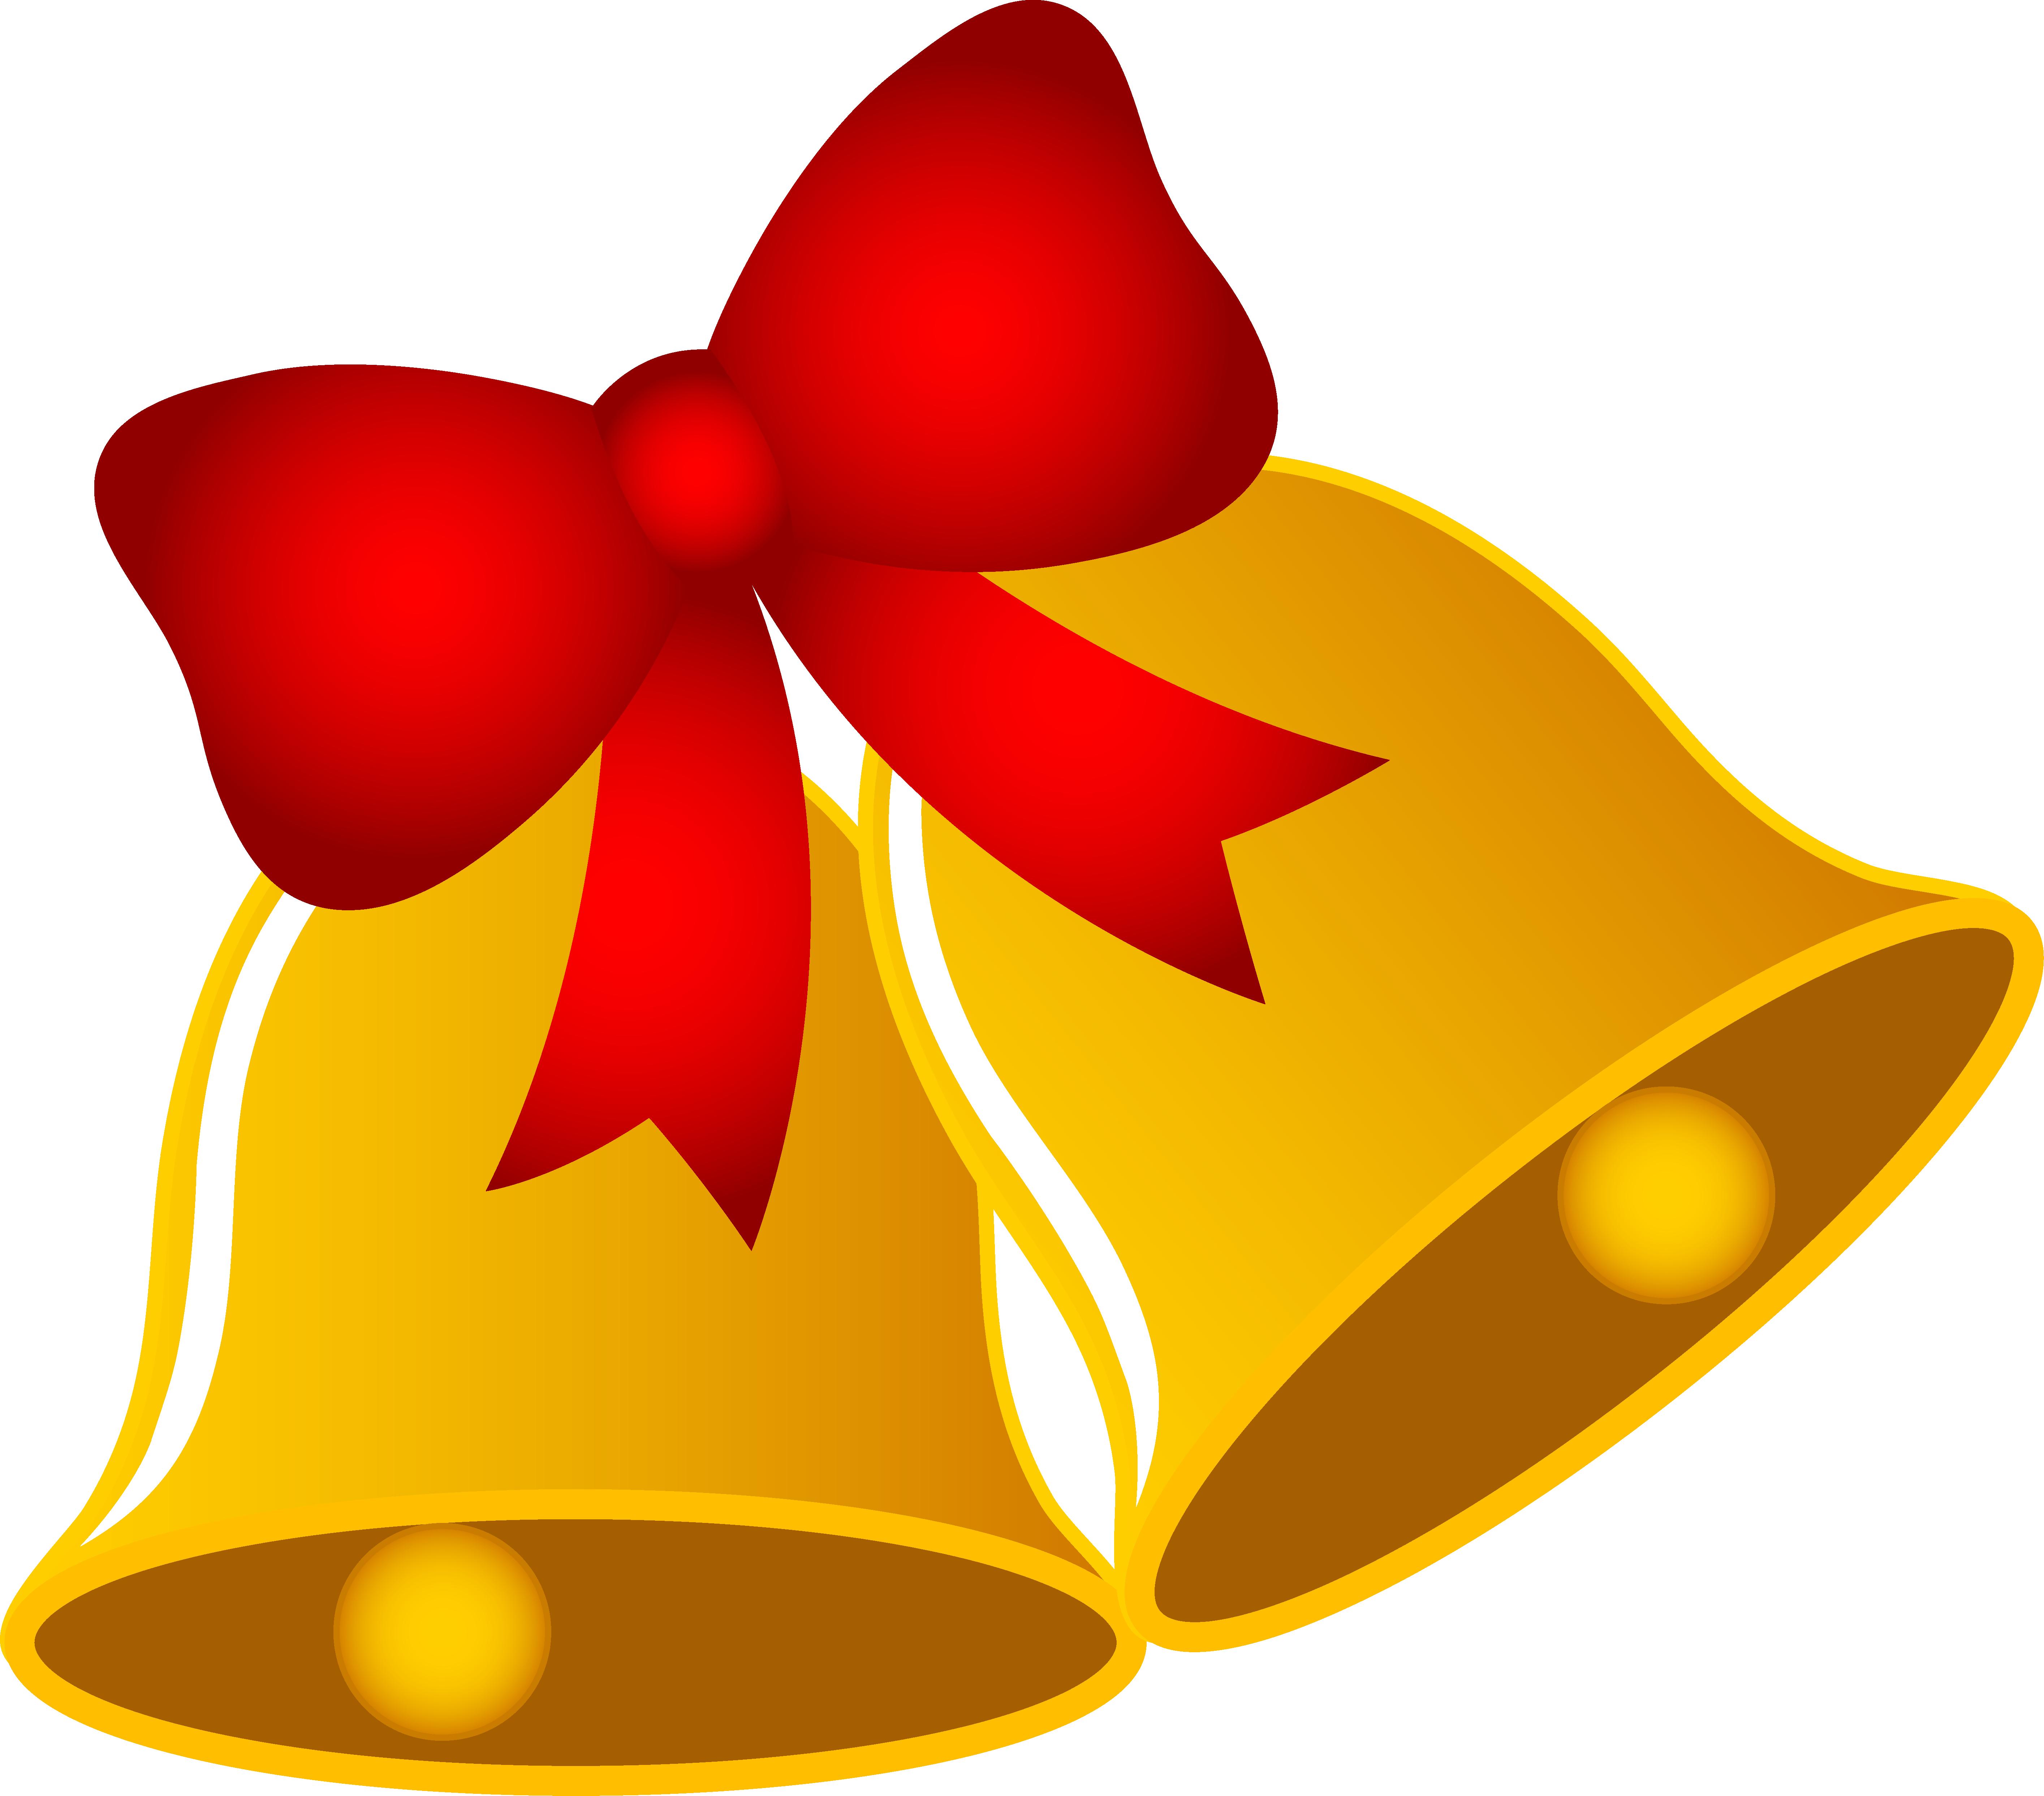 Big Red Christmas Bow And Ribbons Stock Illustration ...   Christmas Clipart Ribbons And Bows